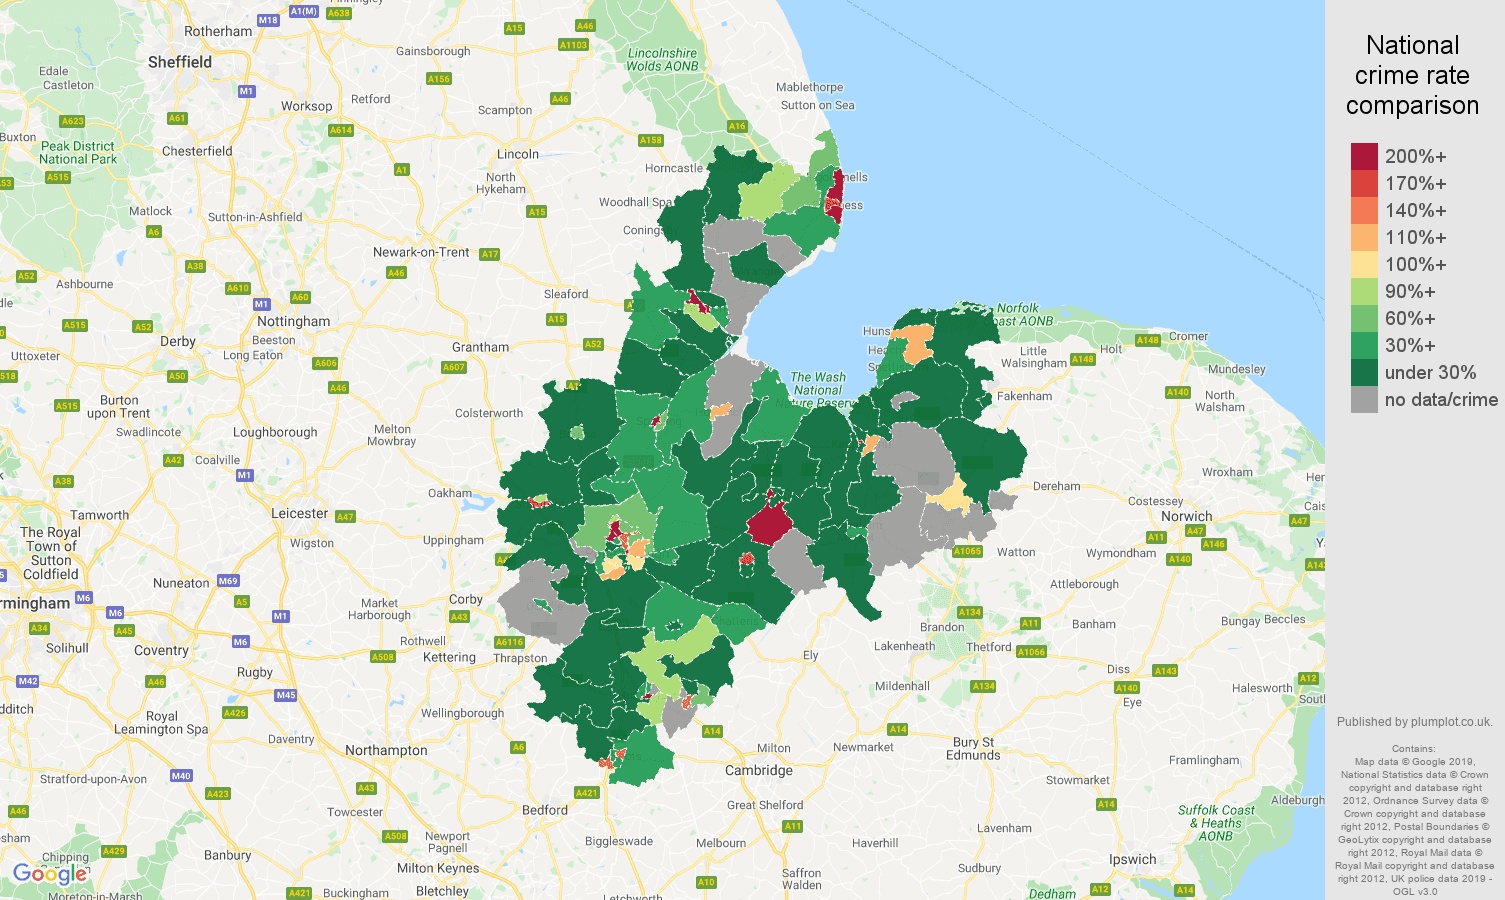 Peterborough shoplifting crime rate comparison map